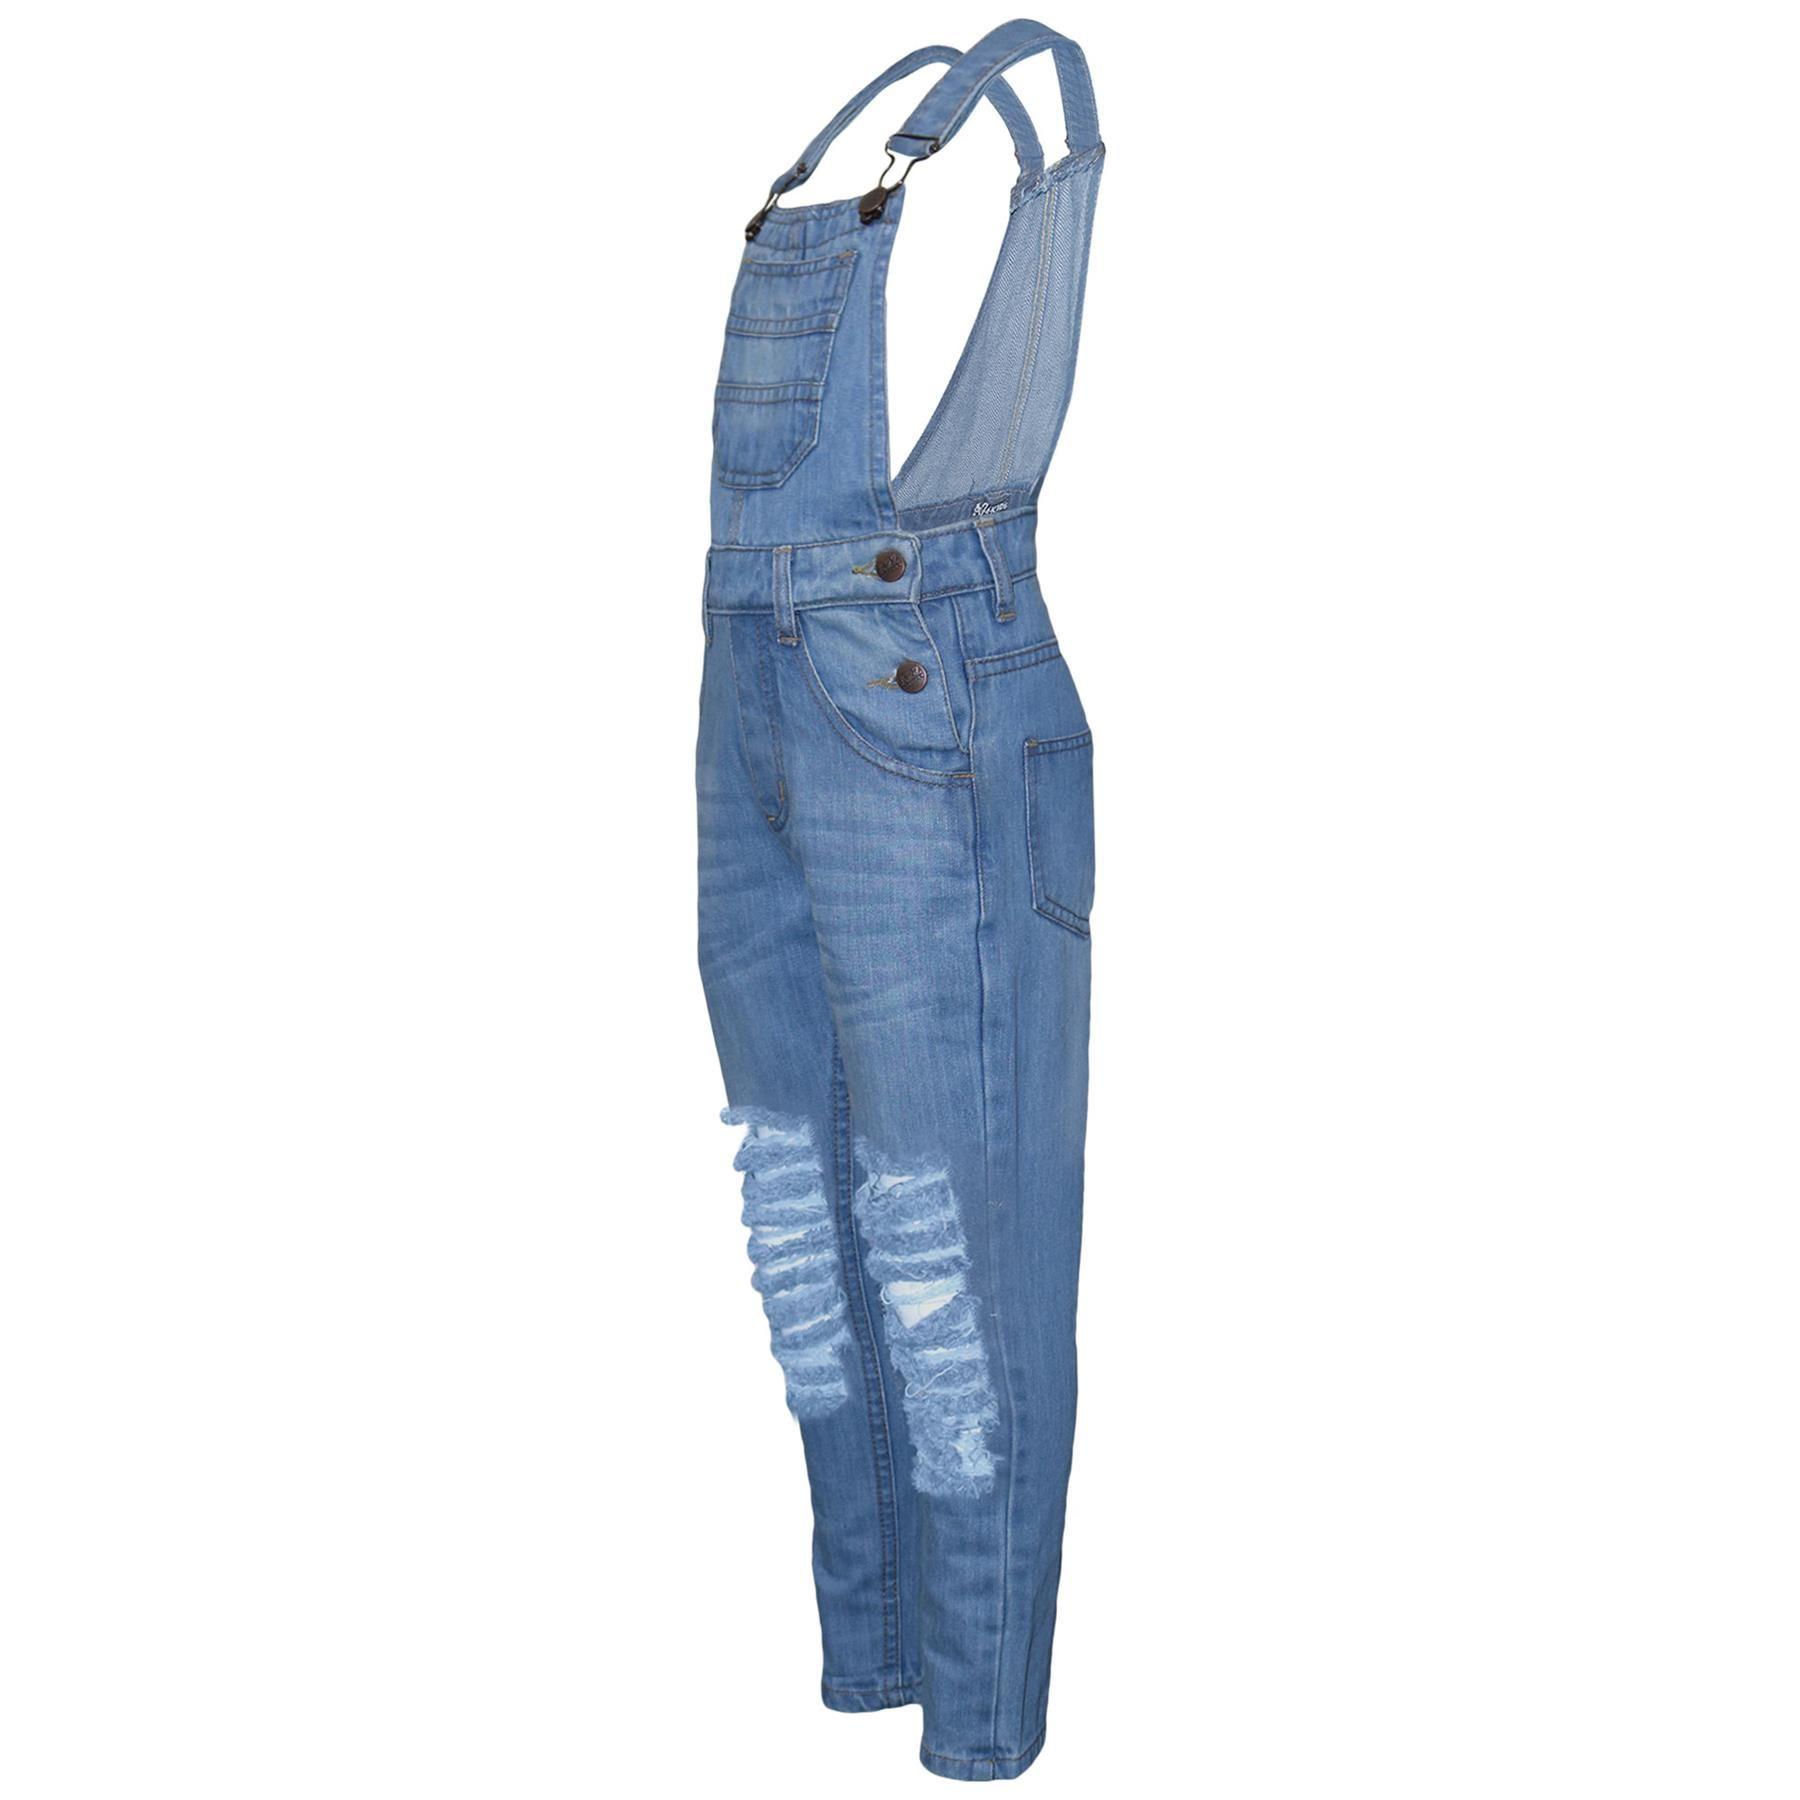 Indexbild 4 - Kinder Mädchen Denim Latzhose Zerrissen Hellblau Jeans Overall Mode Overall 5-13